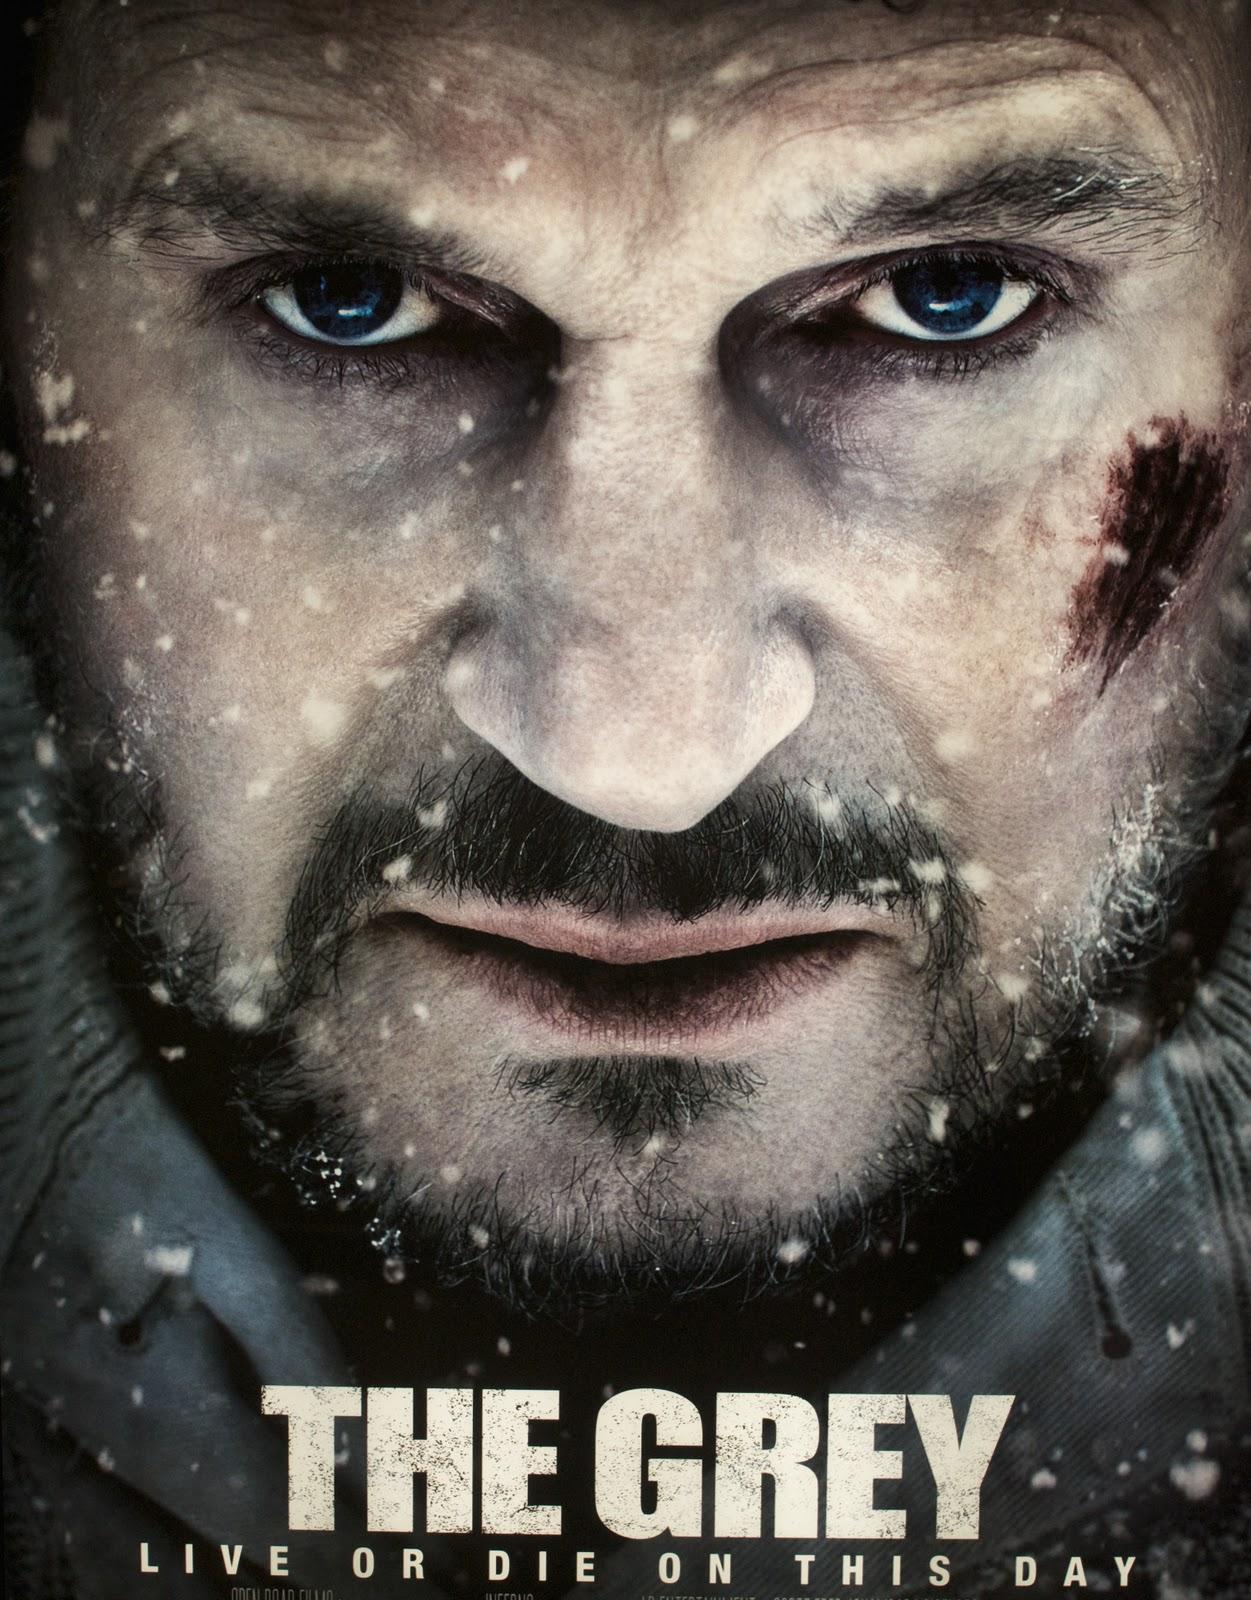 http://1.bp.blogspot.com/-45pWLoaKmUE/TyP9-9u85II/AAAAAAAACCY/snuhM9vA7mU/s1600/The+Grey+Liam+Neeson+one-sheet.jpg